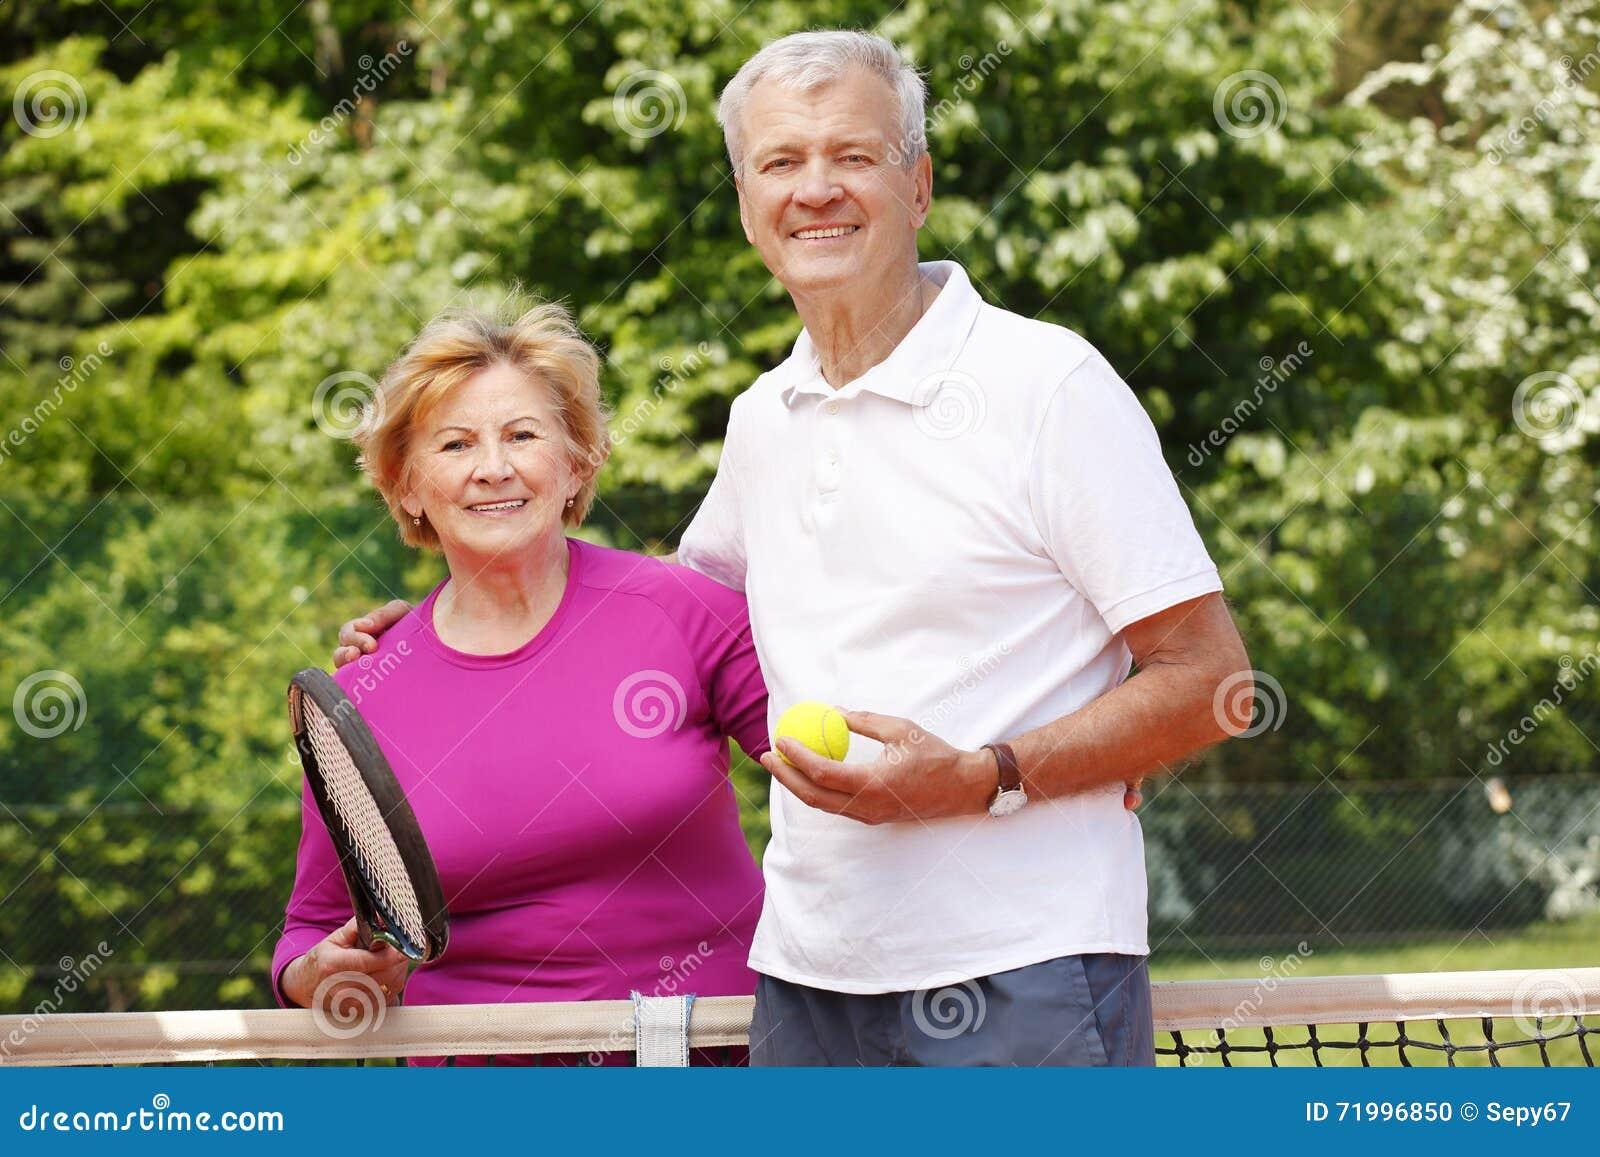 Senior people match